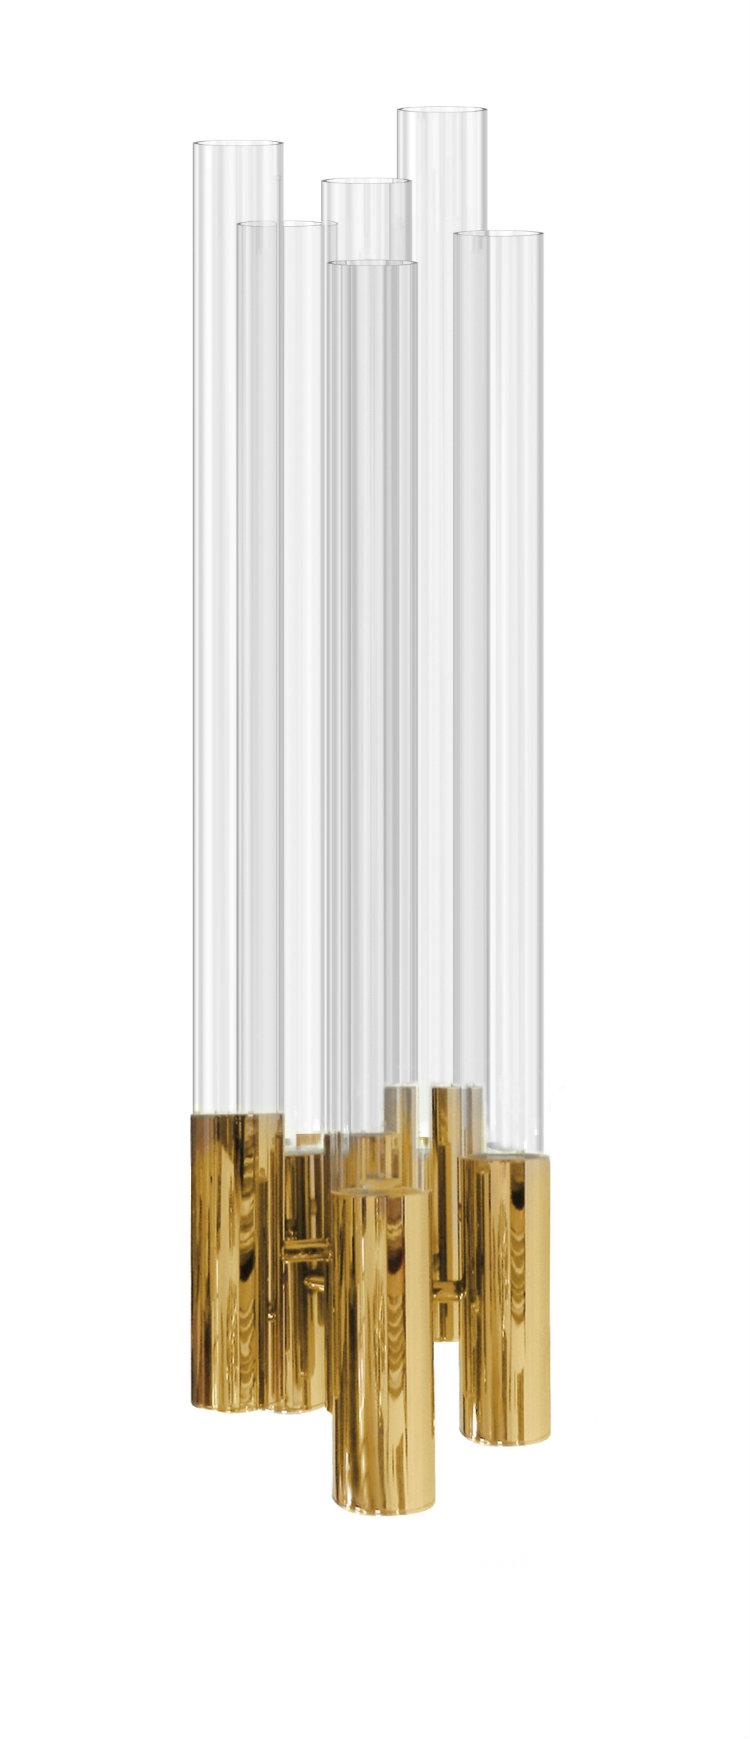 ICFF 2018 Meet the Burj Wall Lamp 04 icff 2018 ICFF 2018: Meet the Burj Wall Lamp ICFF 2018 Meet the Burj Wall Lamp 04